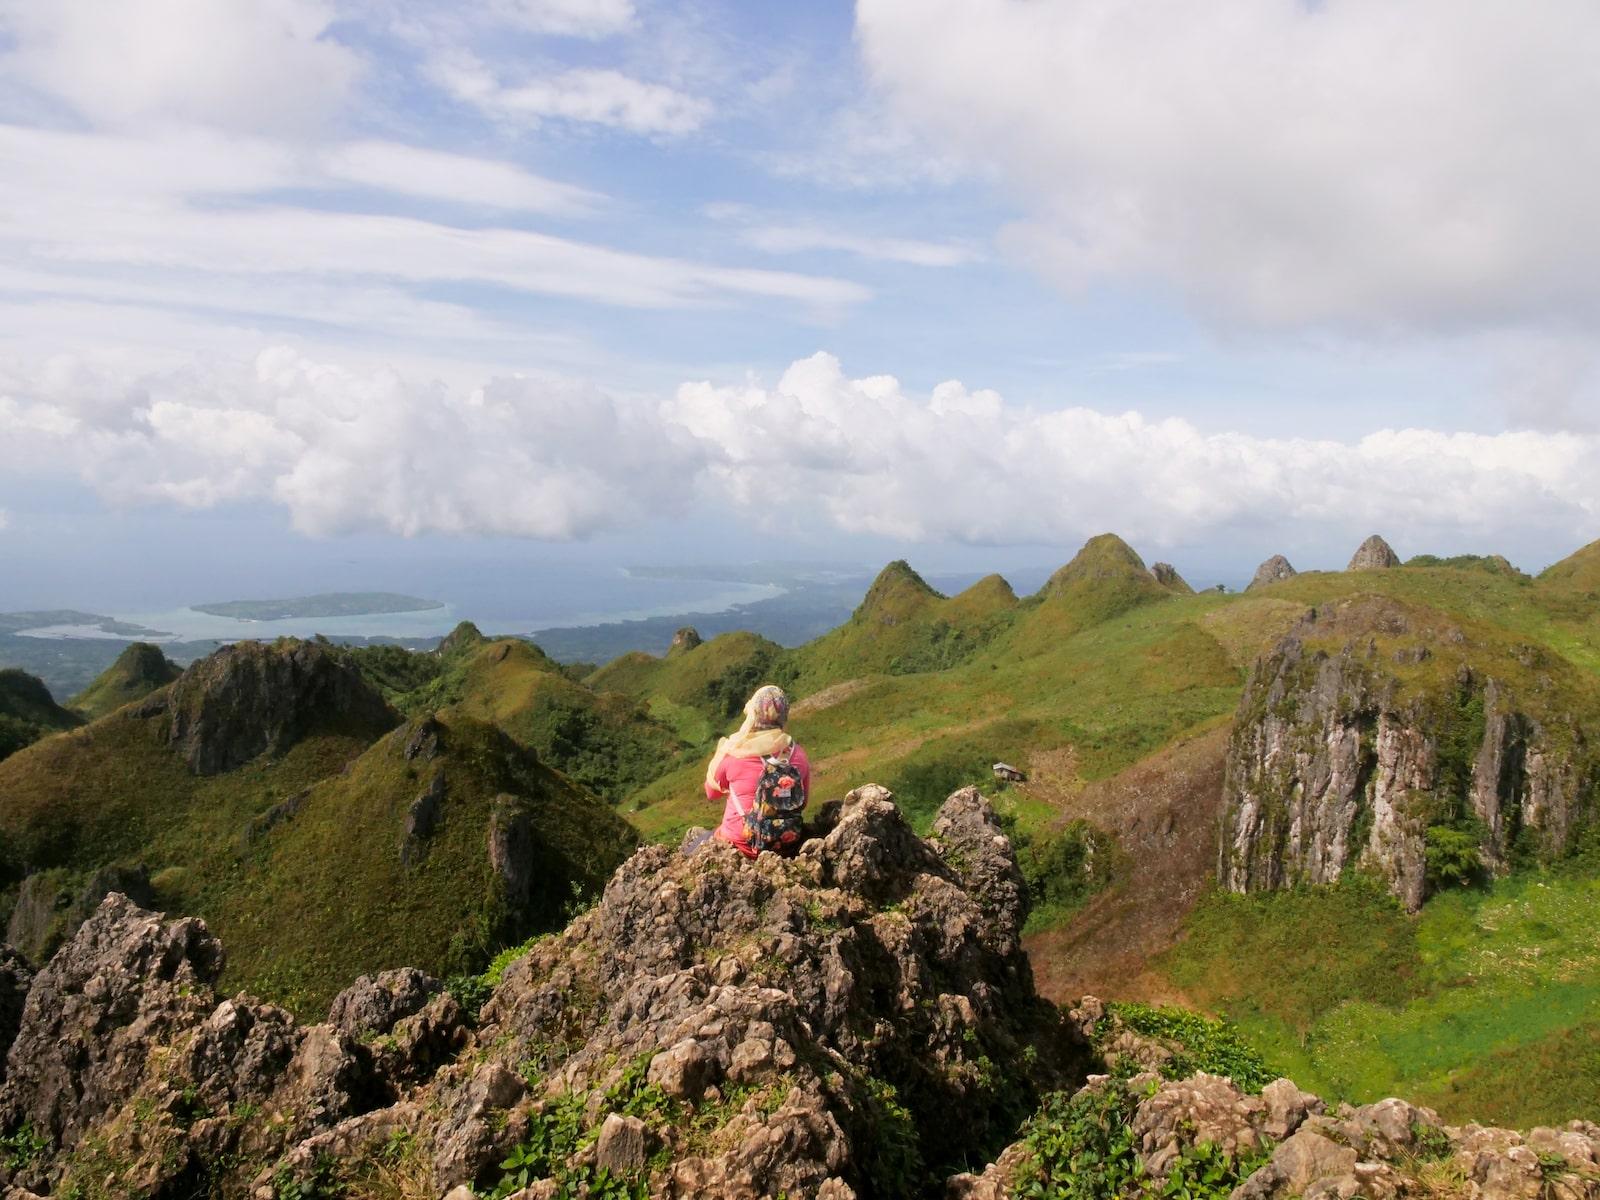 Cebu Osmeña Peak Hike & Canyoneering Tour with Lunch and Transfers from Cebu City